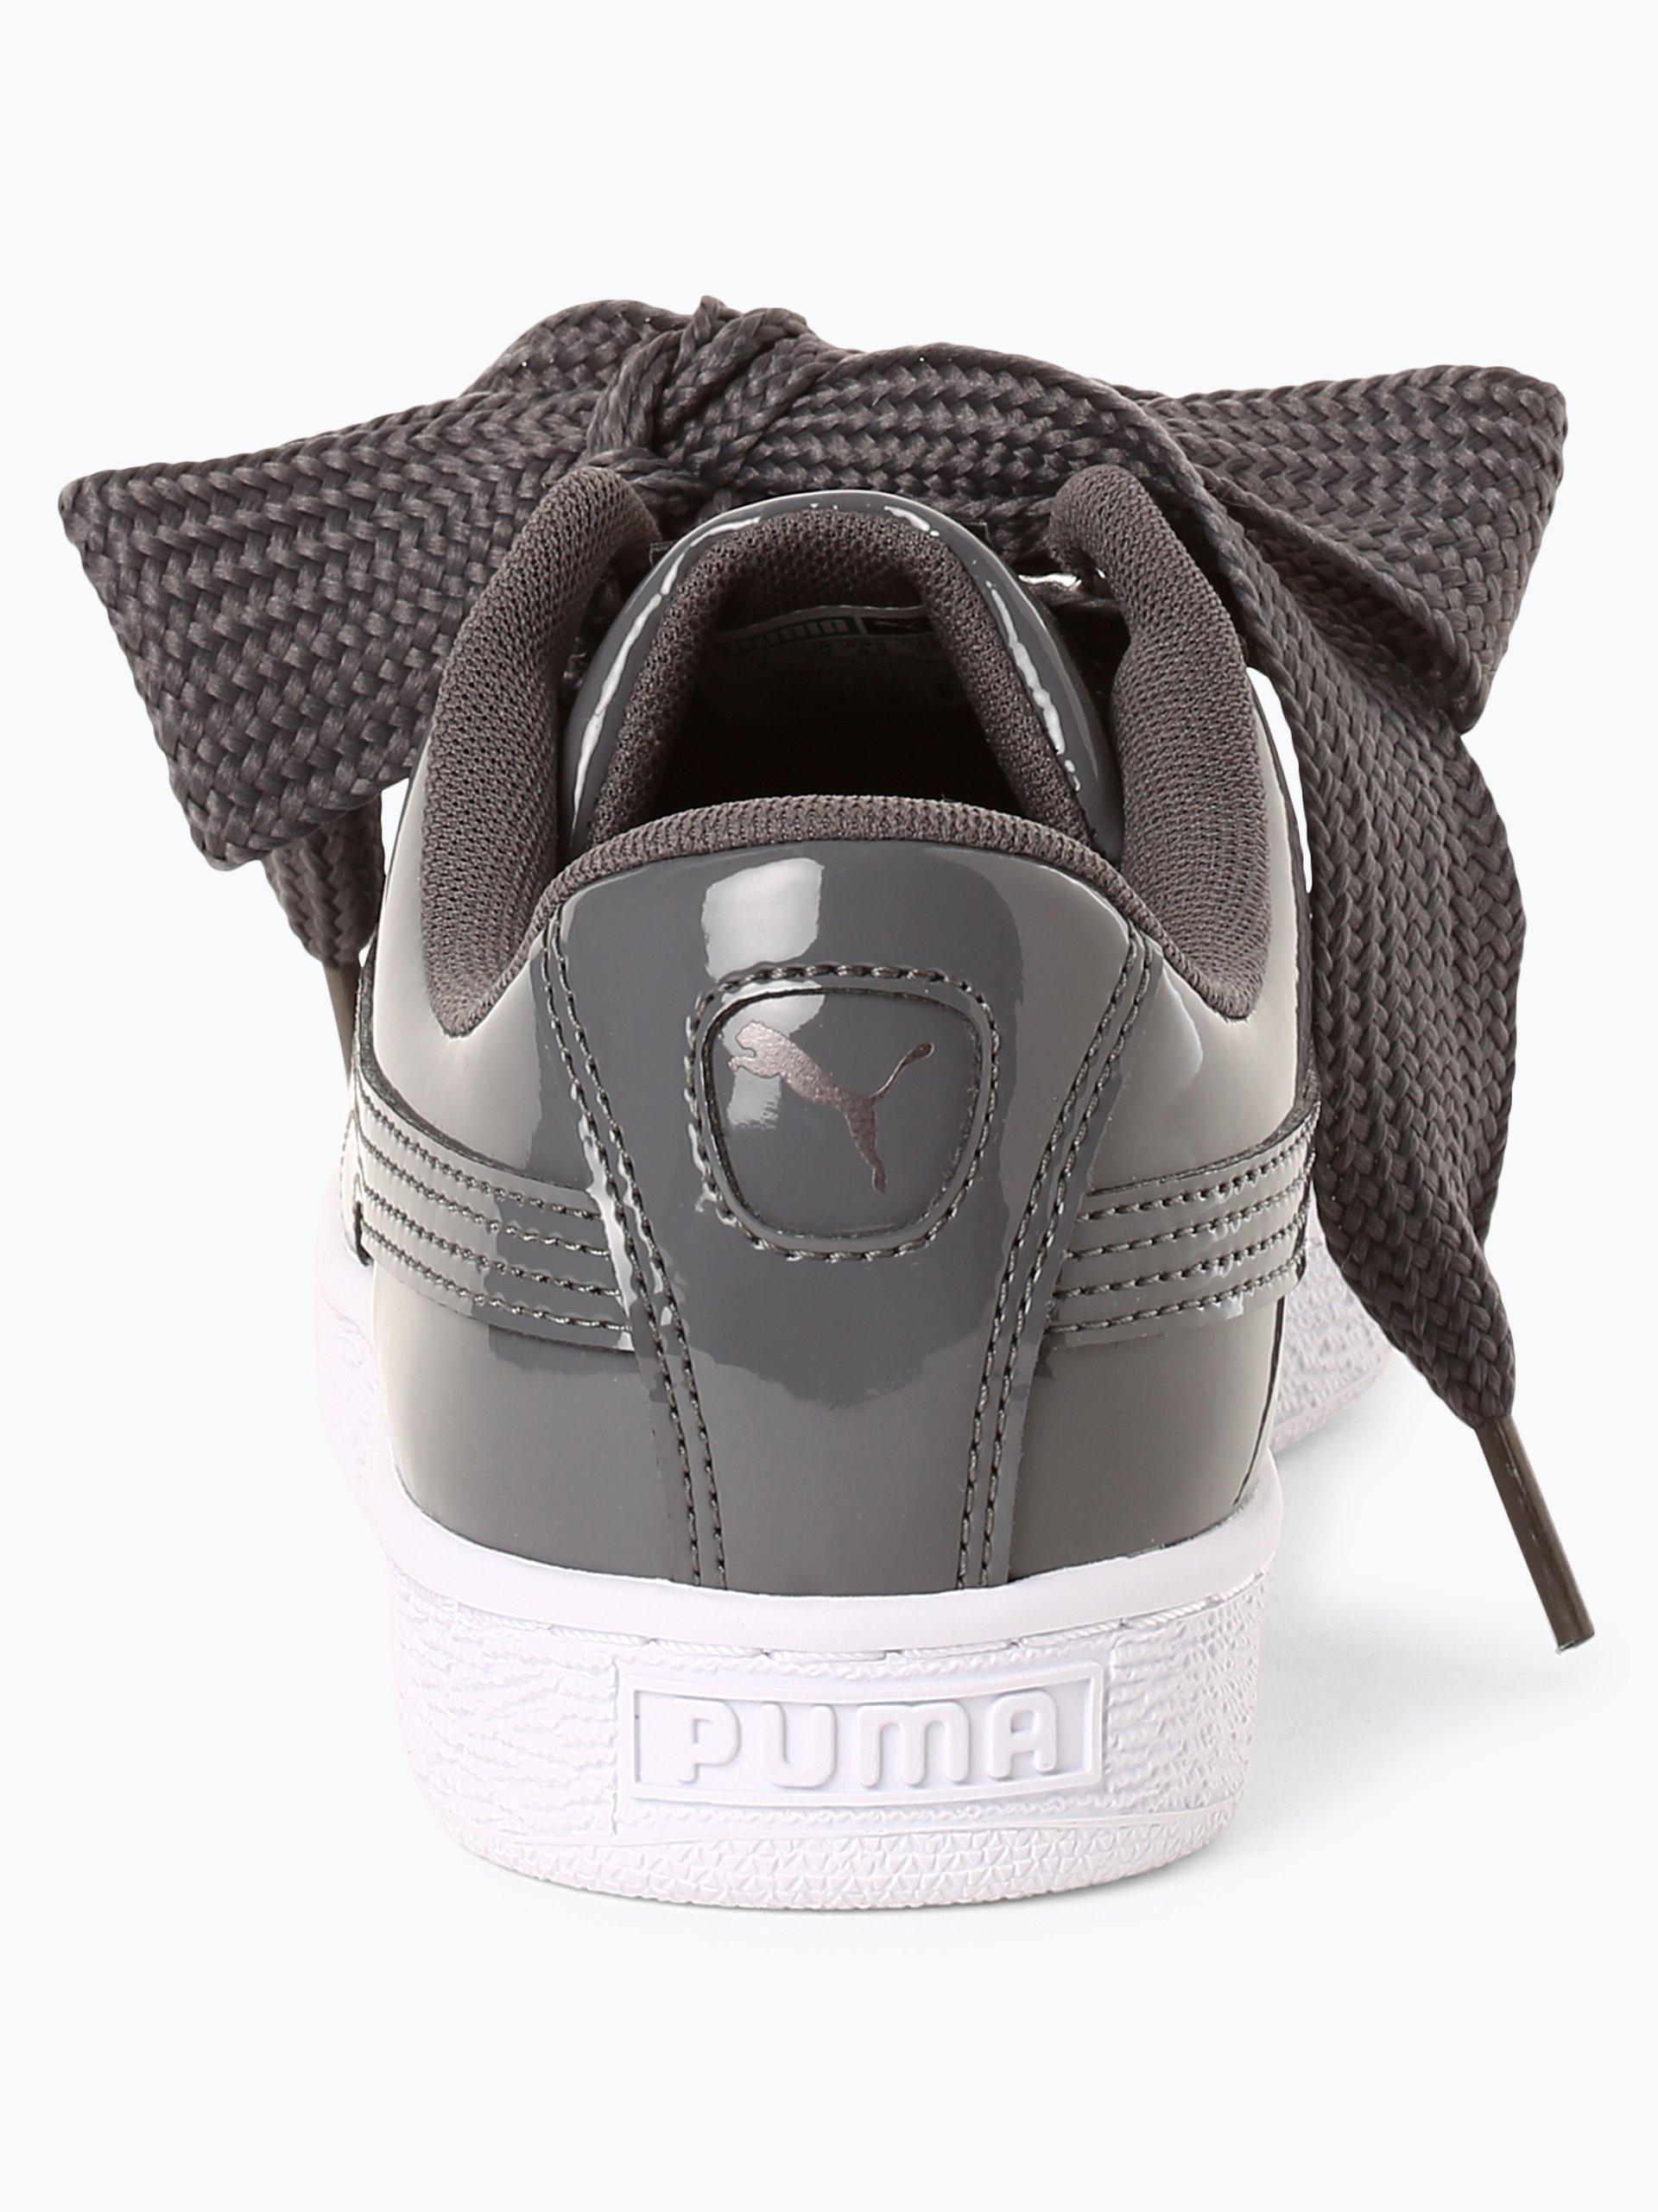 Puma Tenisówki damskie – Basket